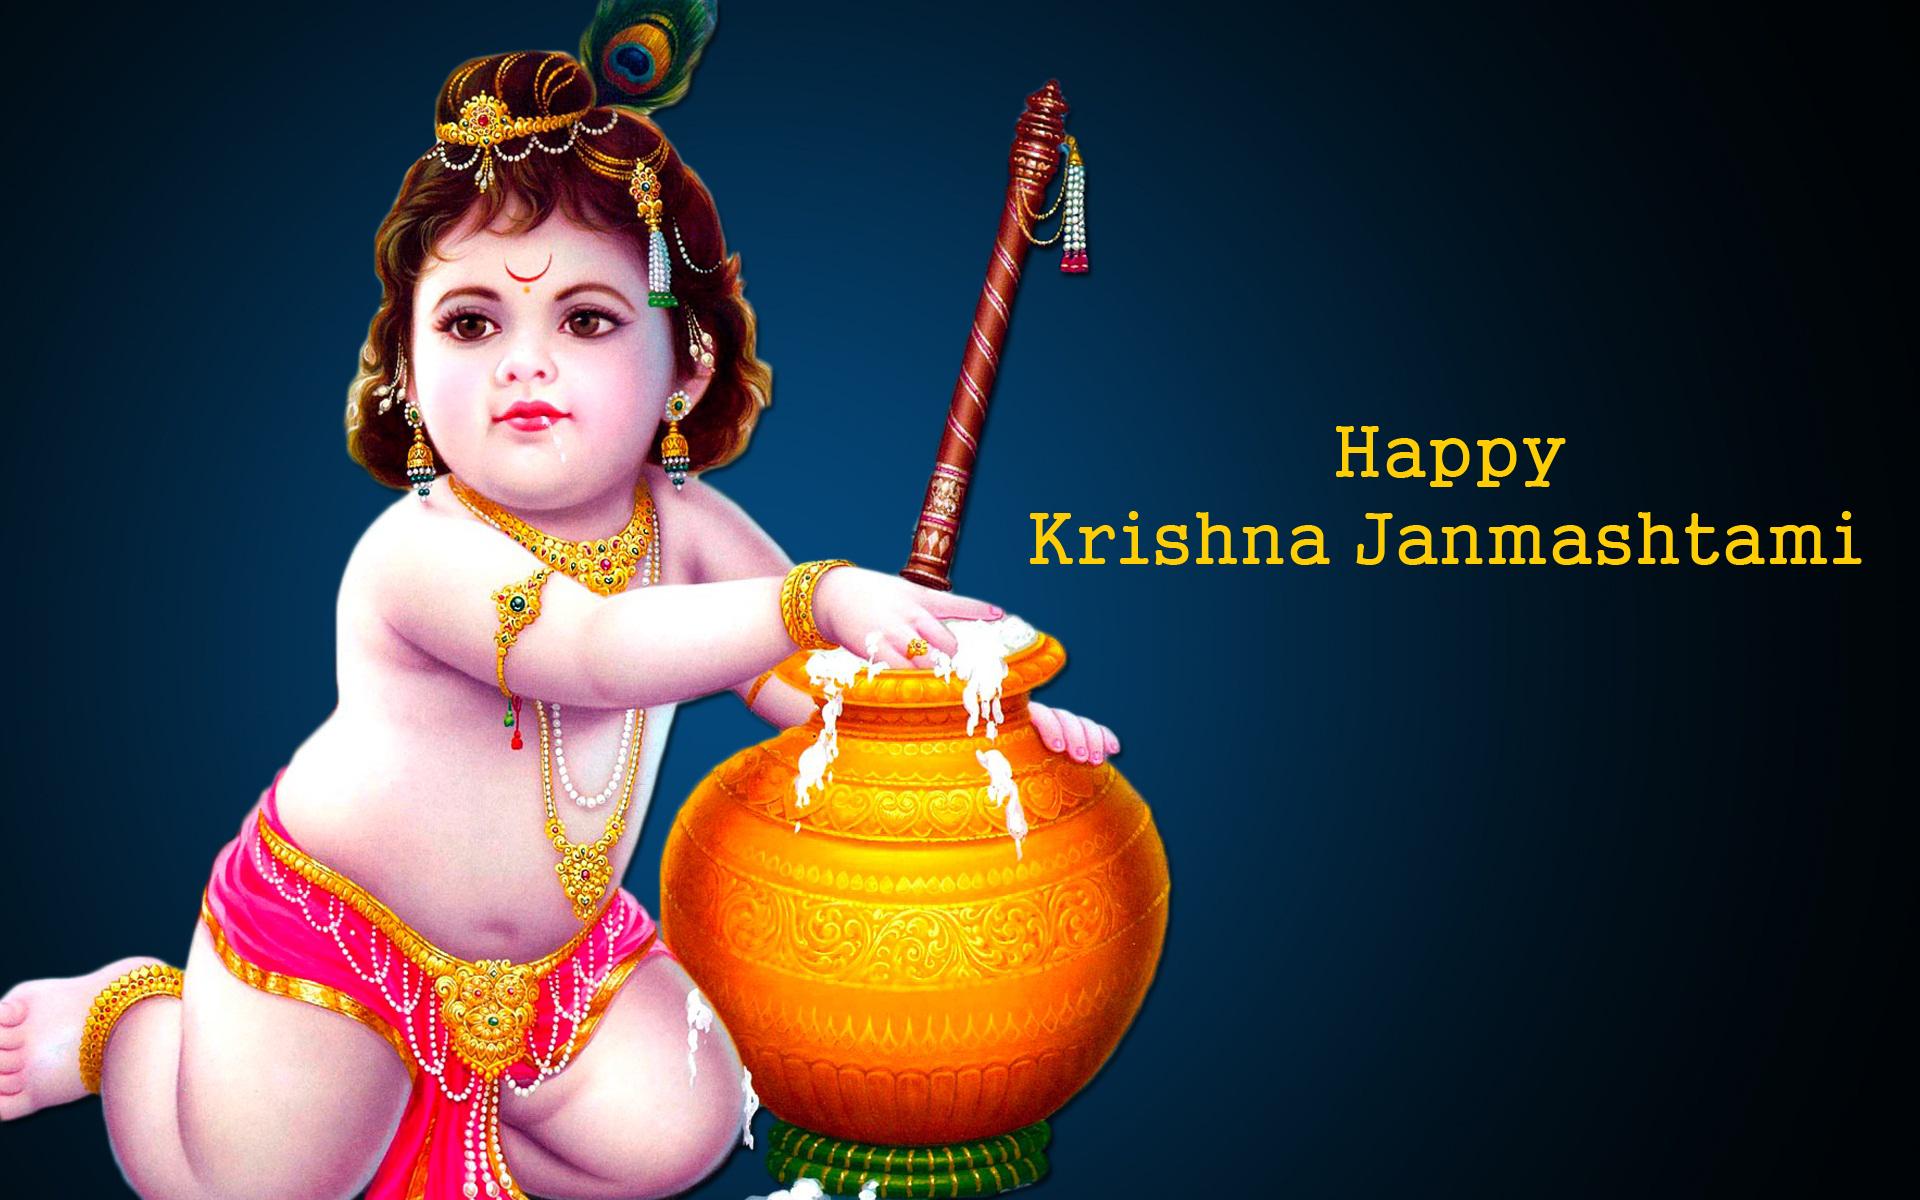 Download Happy Krishna Janmashtami HD Wallpaper